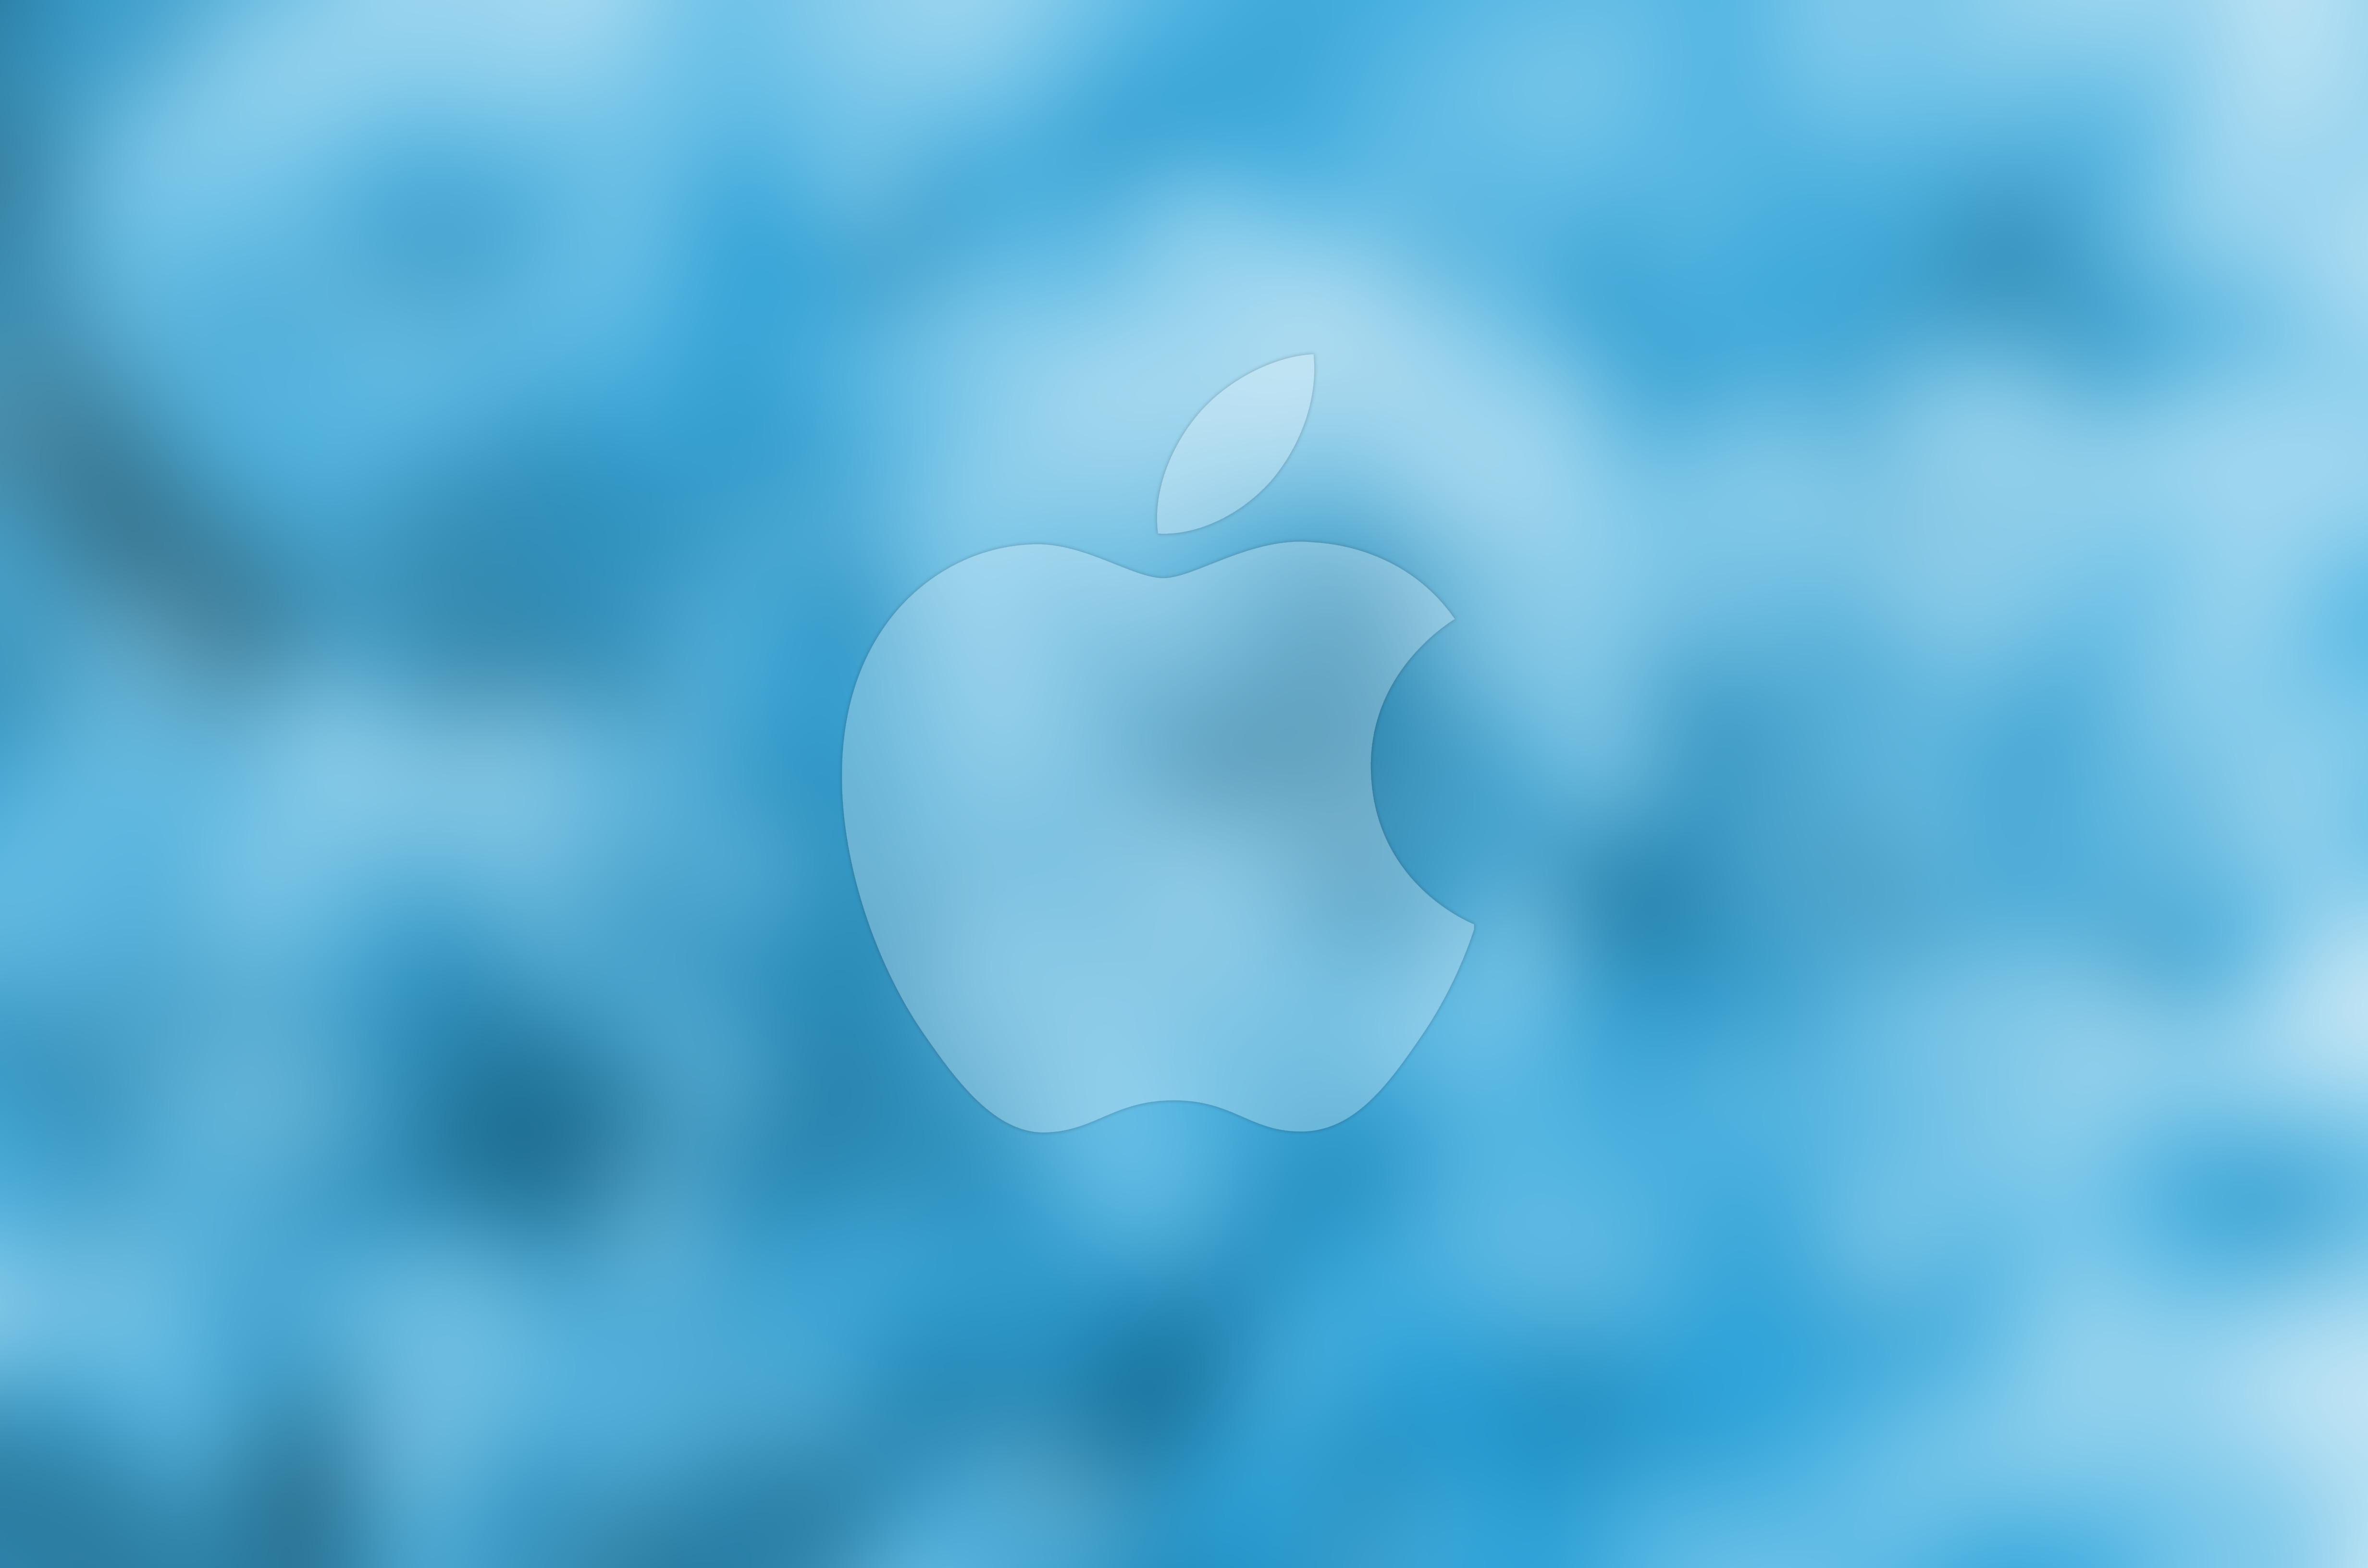 https://img3.goodfon.ru/original/4928x3264/d/3d/apple-ios-iphone-imac-blurred-2598.jpg